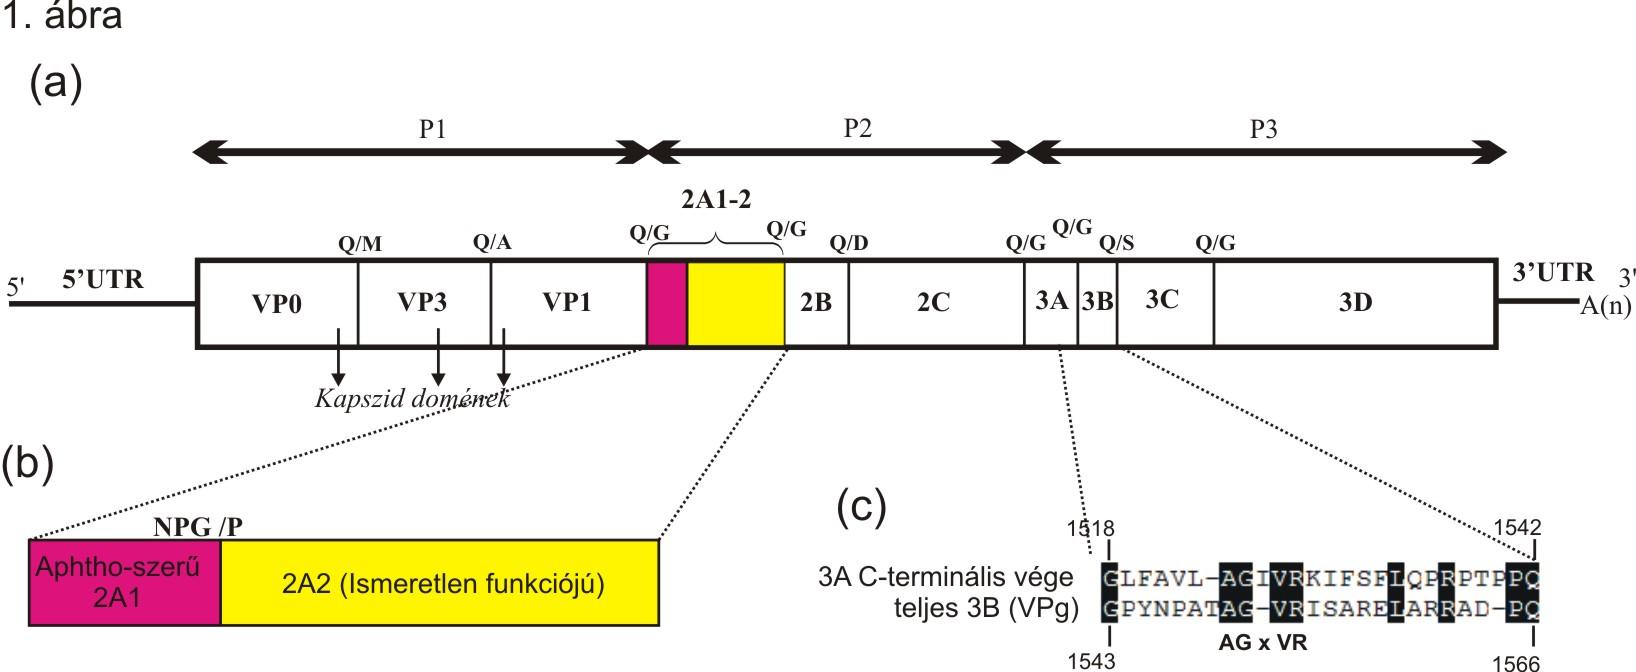 Kunsagivirus-1.abra.jpg